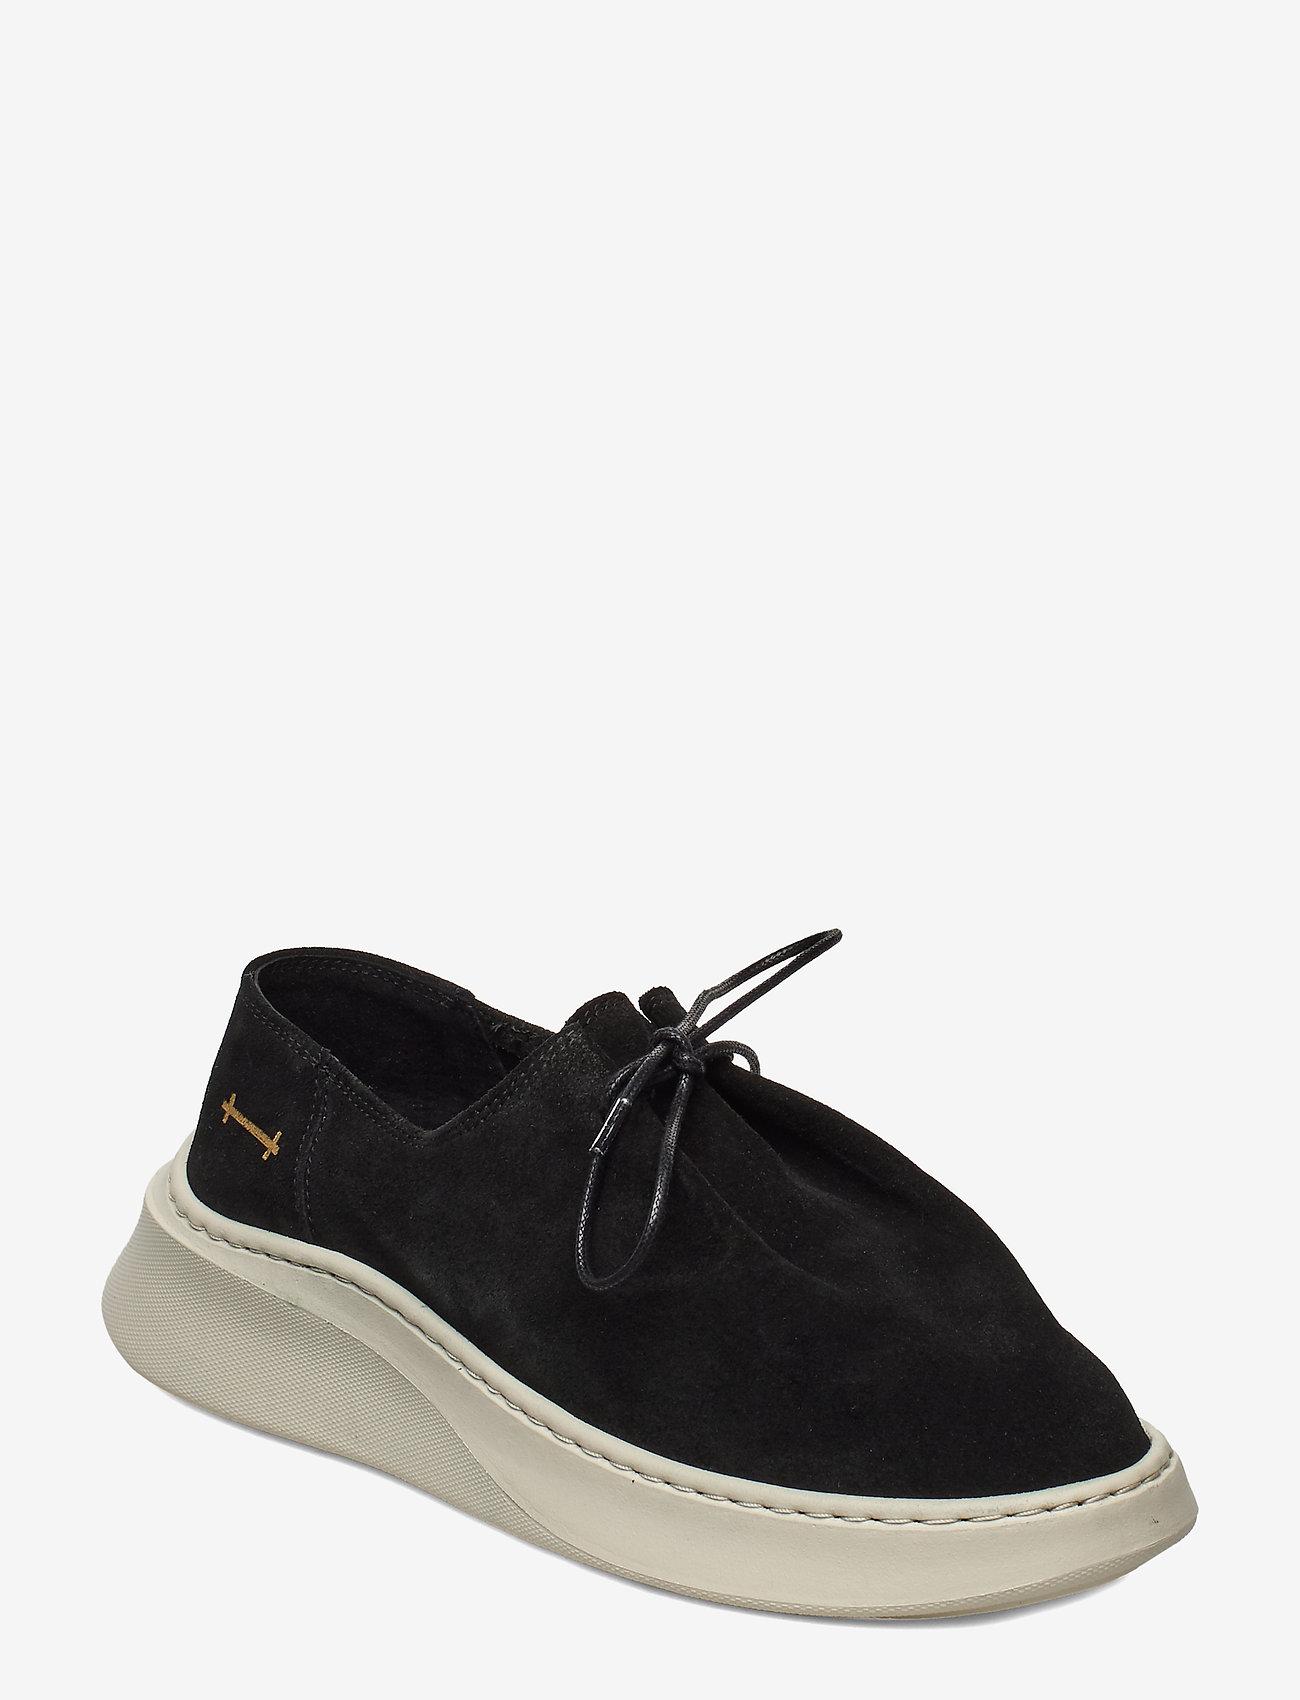 Gram - yatfai sneaker black suede - buty sznurowane - black - 0